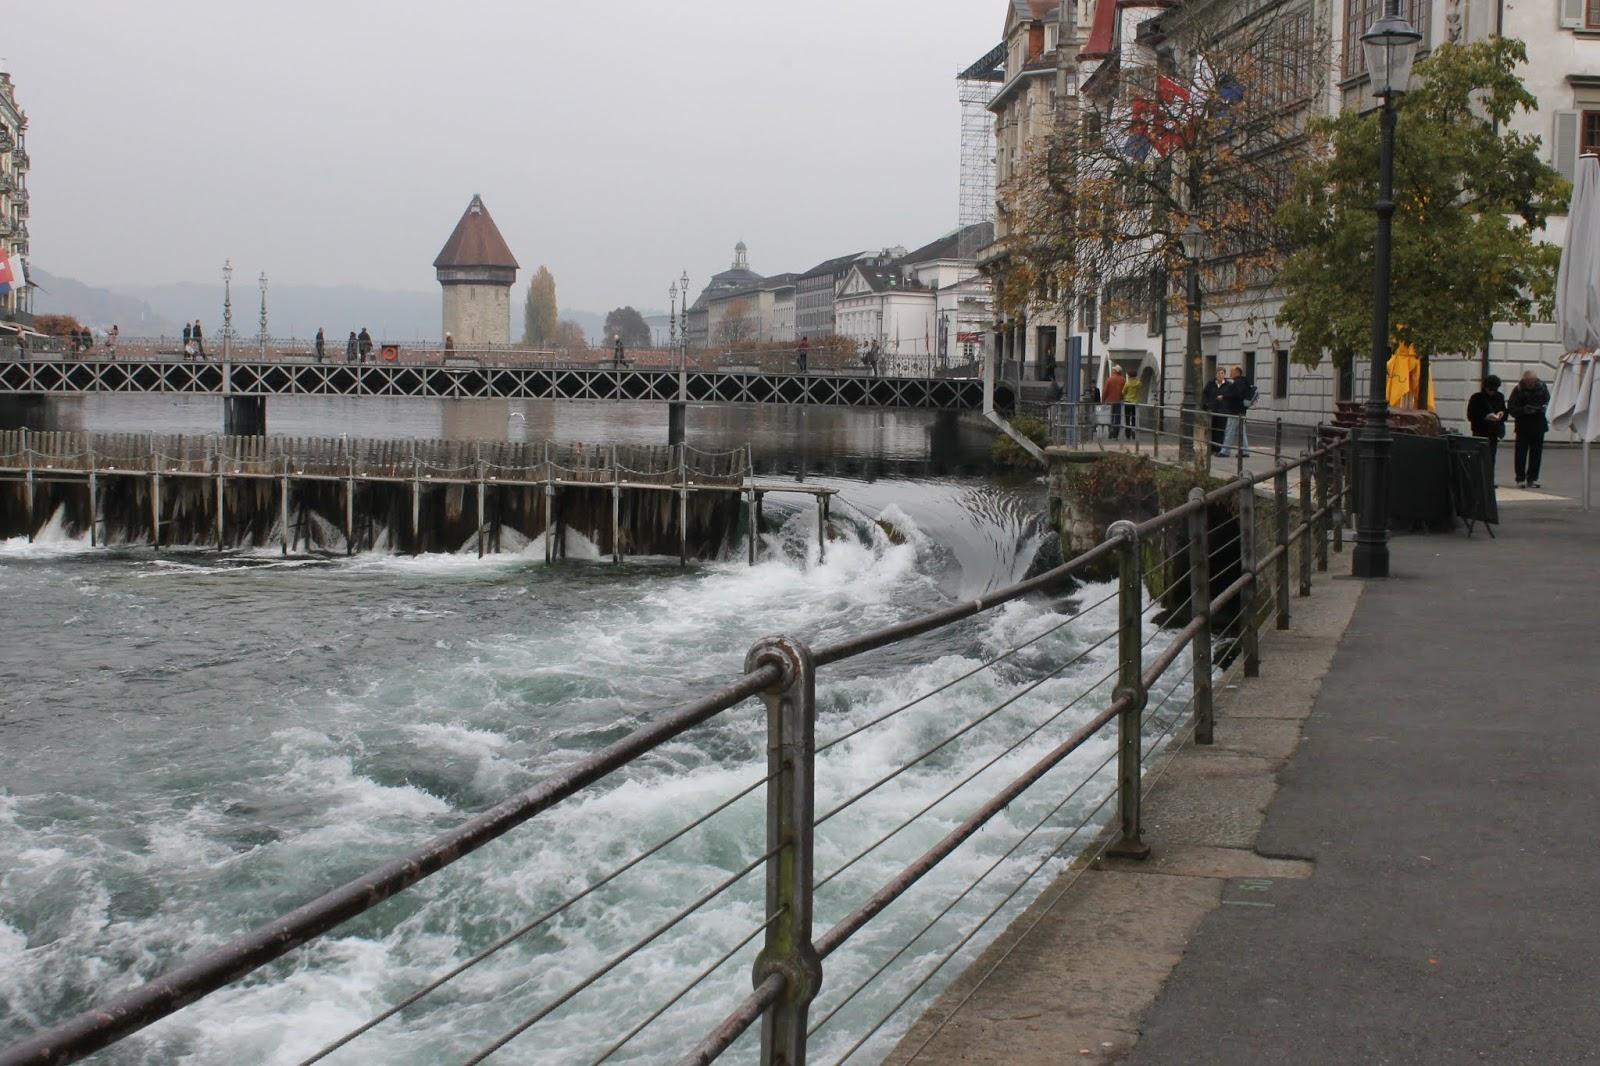 Needle Dam - Luzern